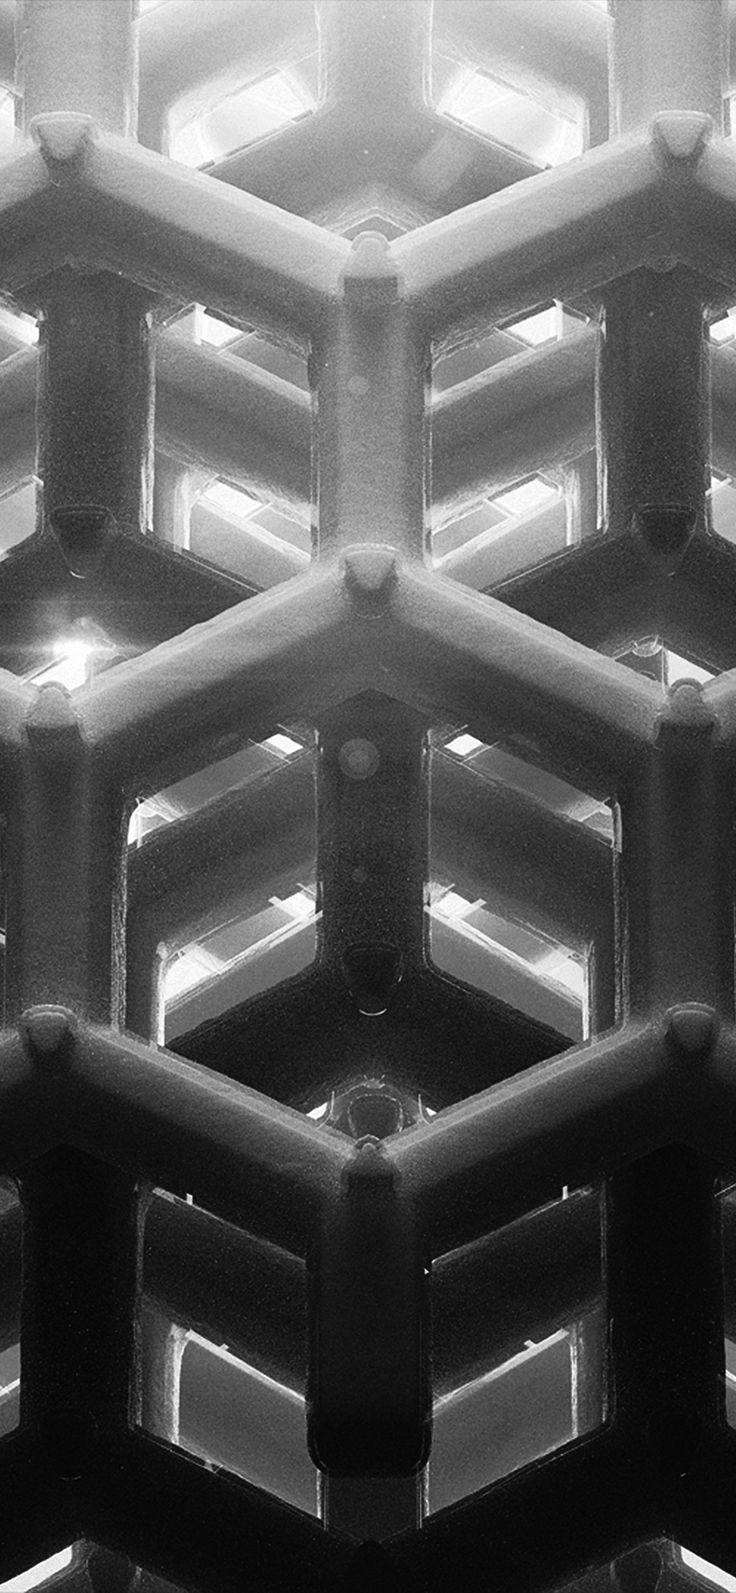 Iphone X Wallpaper Vp91honey Cube Pattern Comb Dark Bw Via